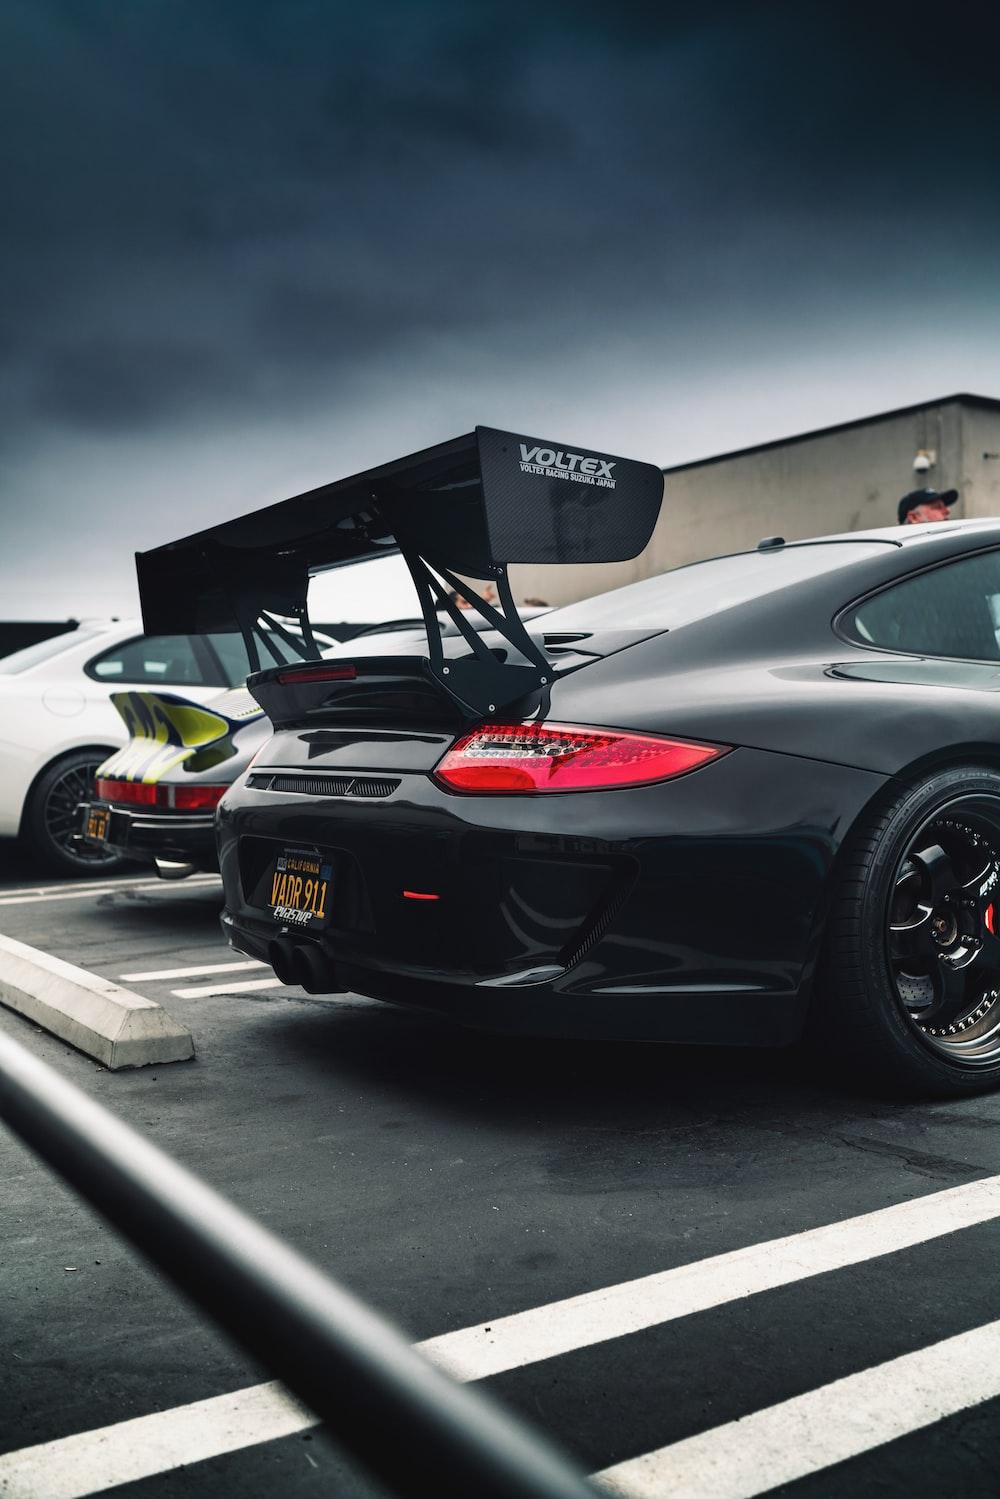 parked black car